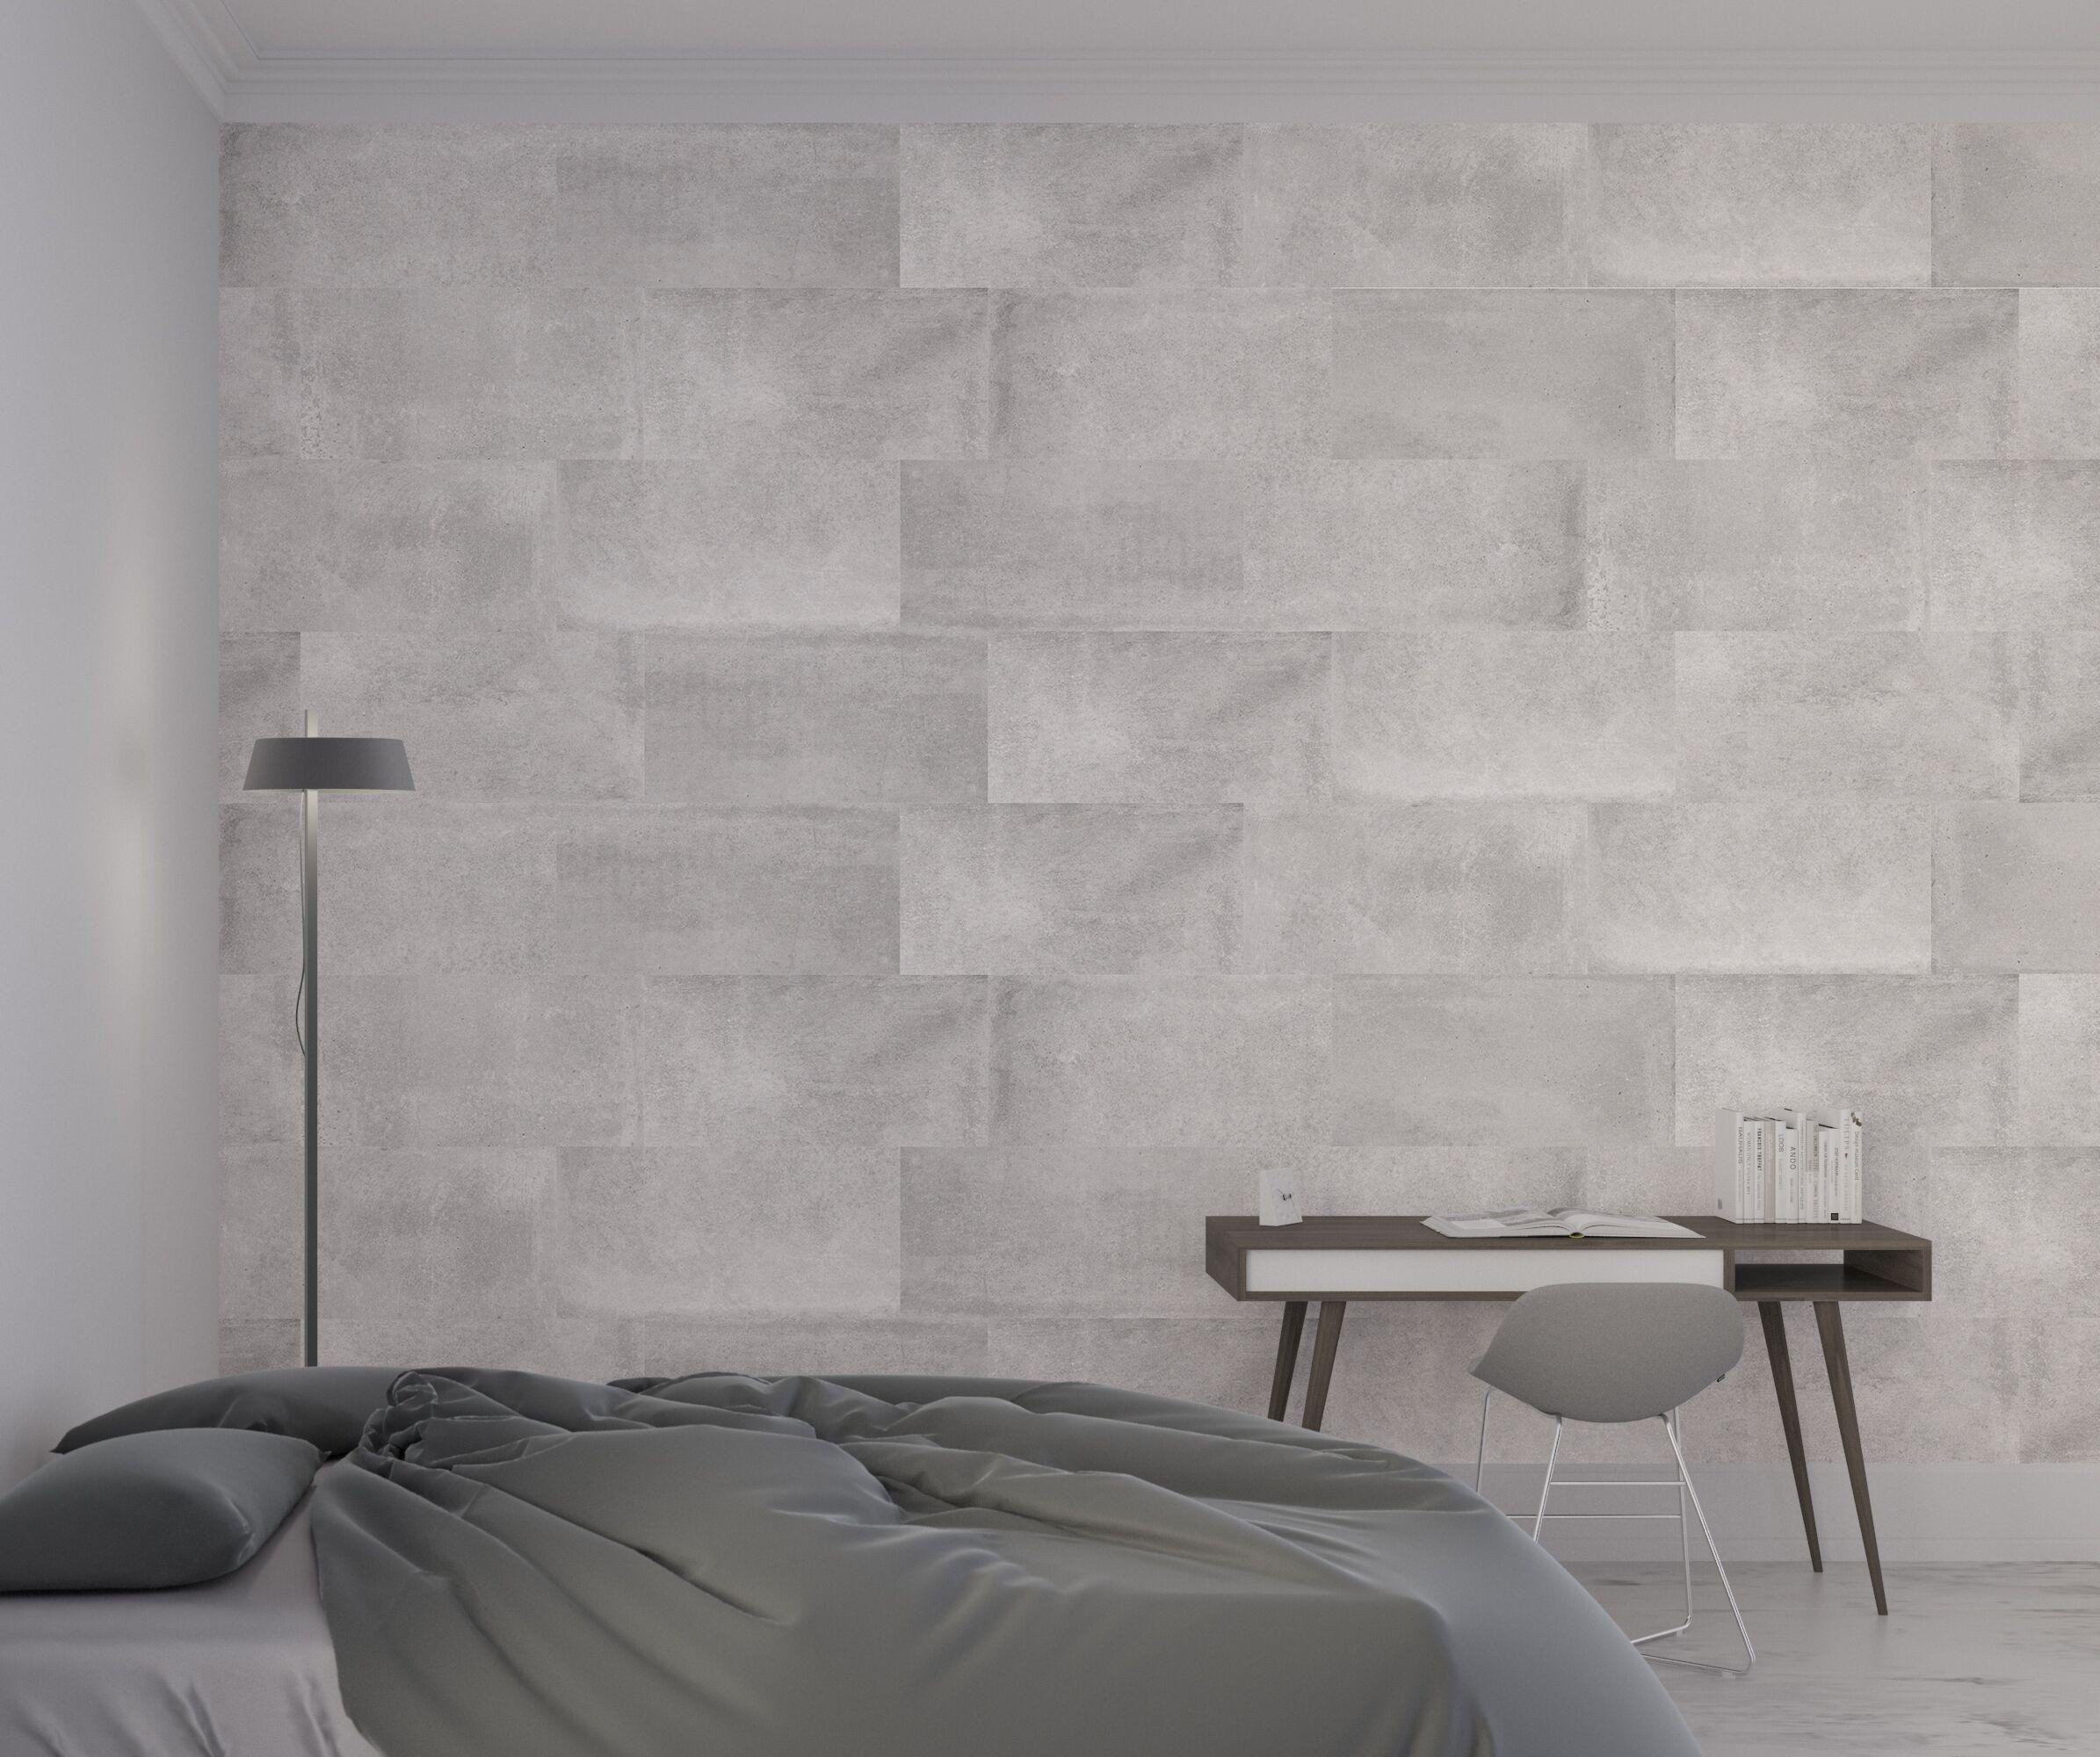 Urban Grey Concrete Effect Porcelain Tile Concrete Wall Texture Wall And Floor Tiles Concrete Tiles Bathroom